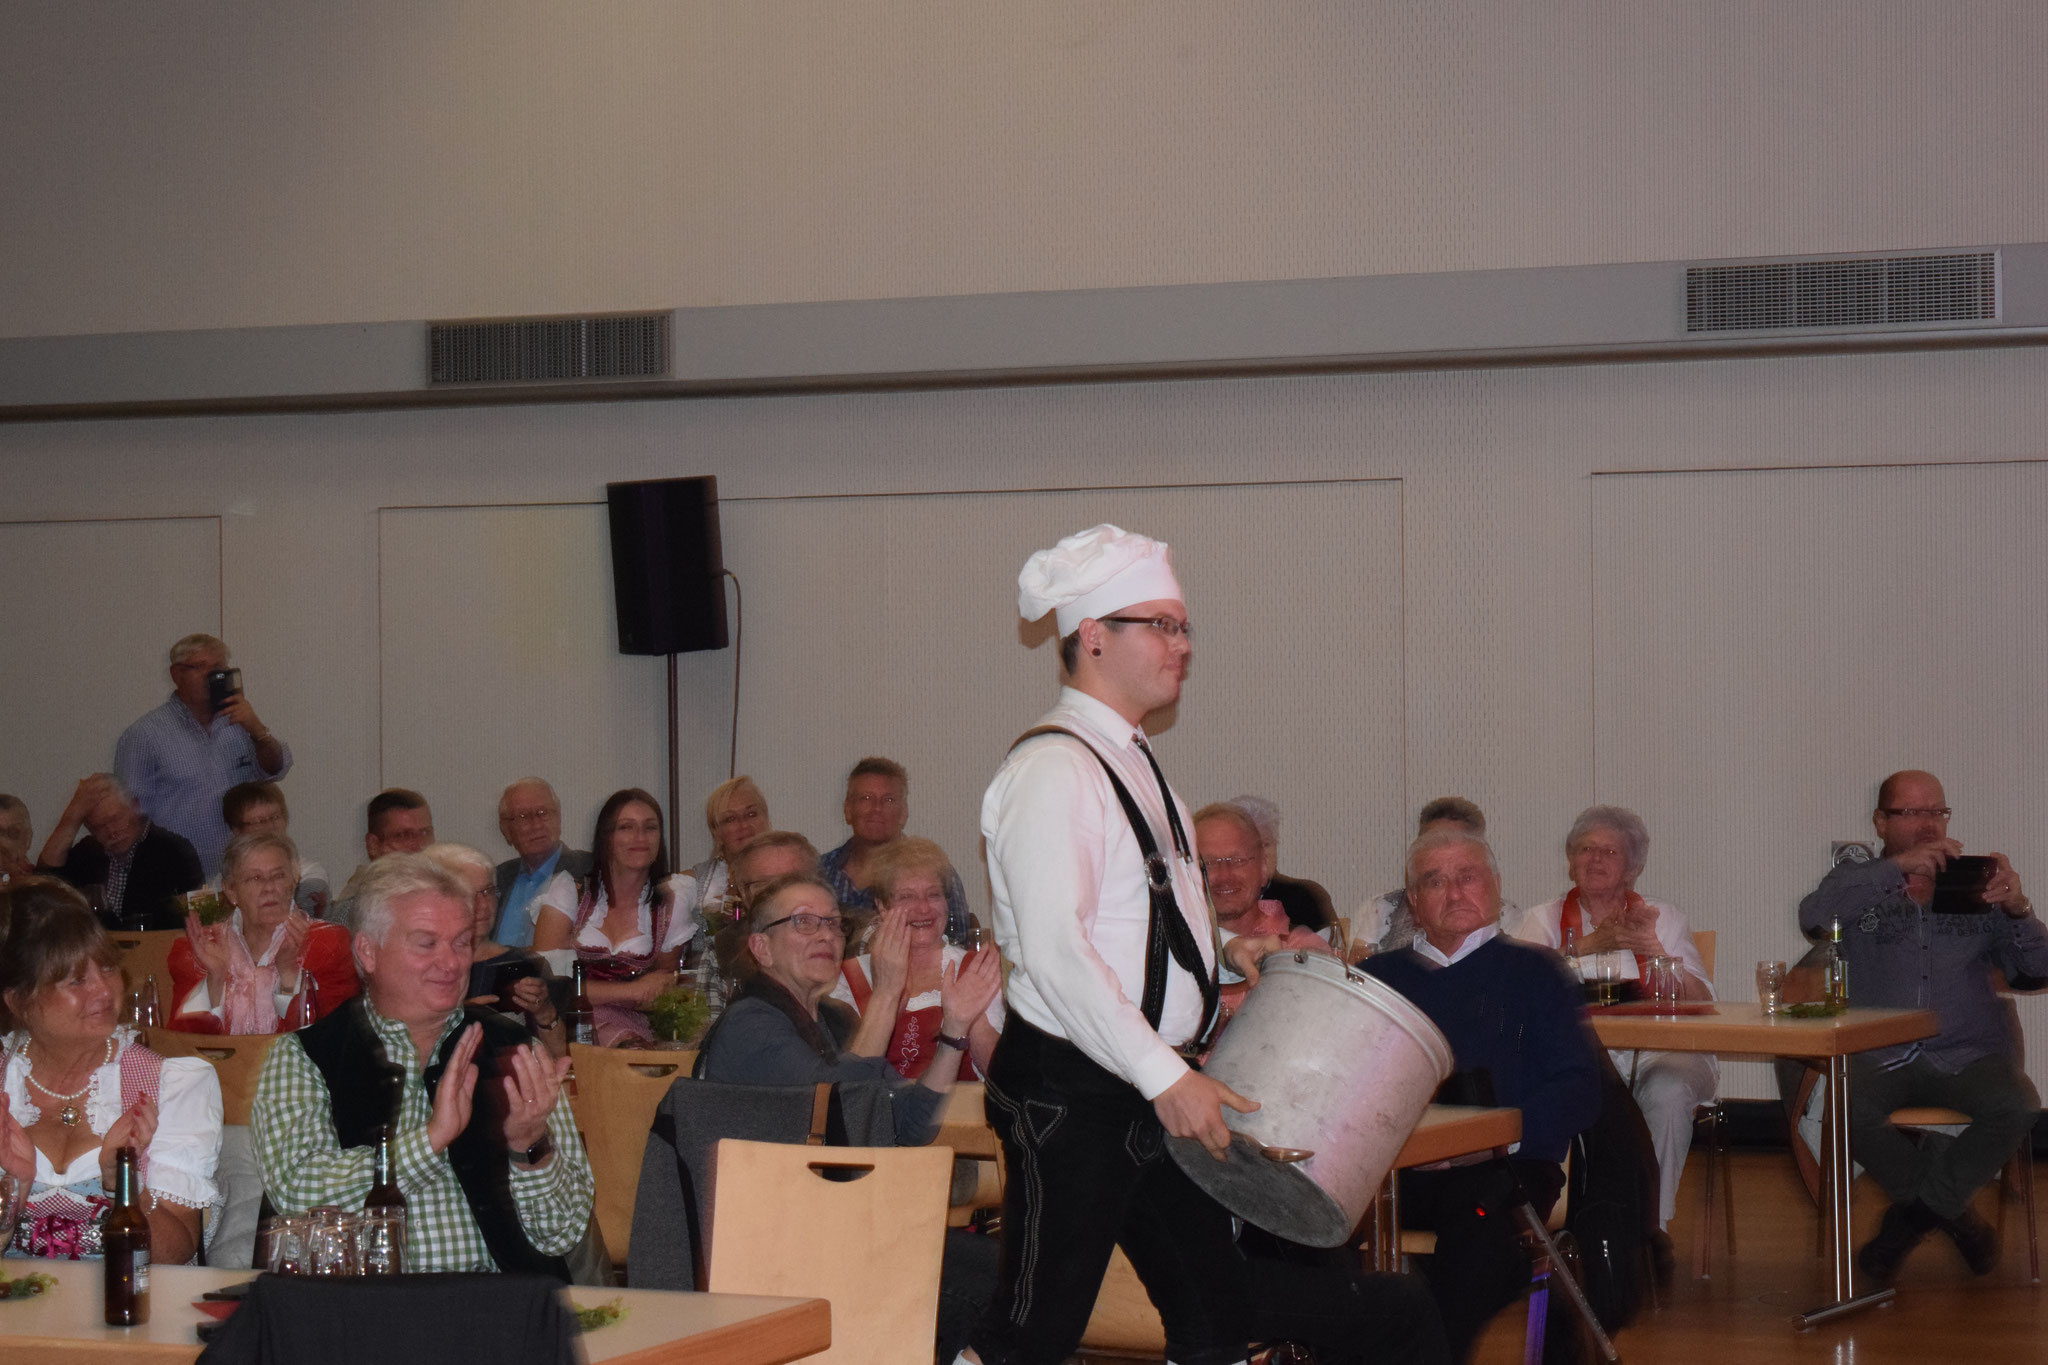 Christian Ersfeld unser Schlagzeuger - Er wird doch wohl nicht kochen wollen ?